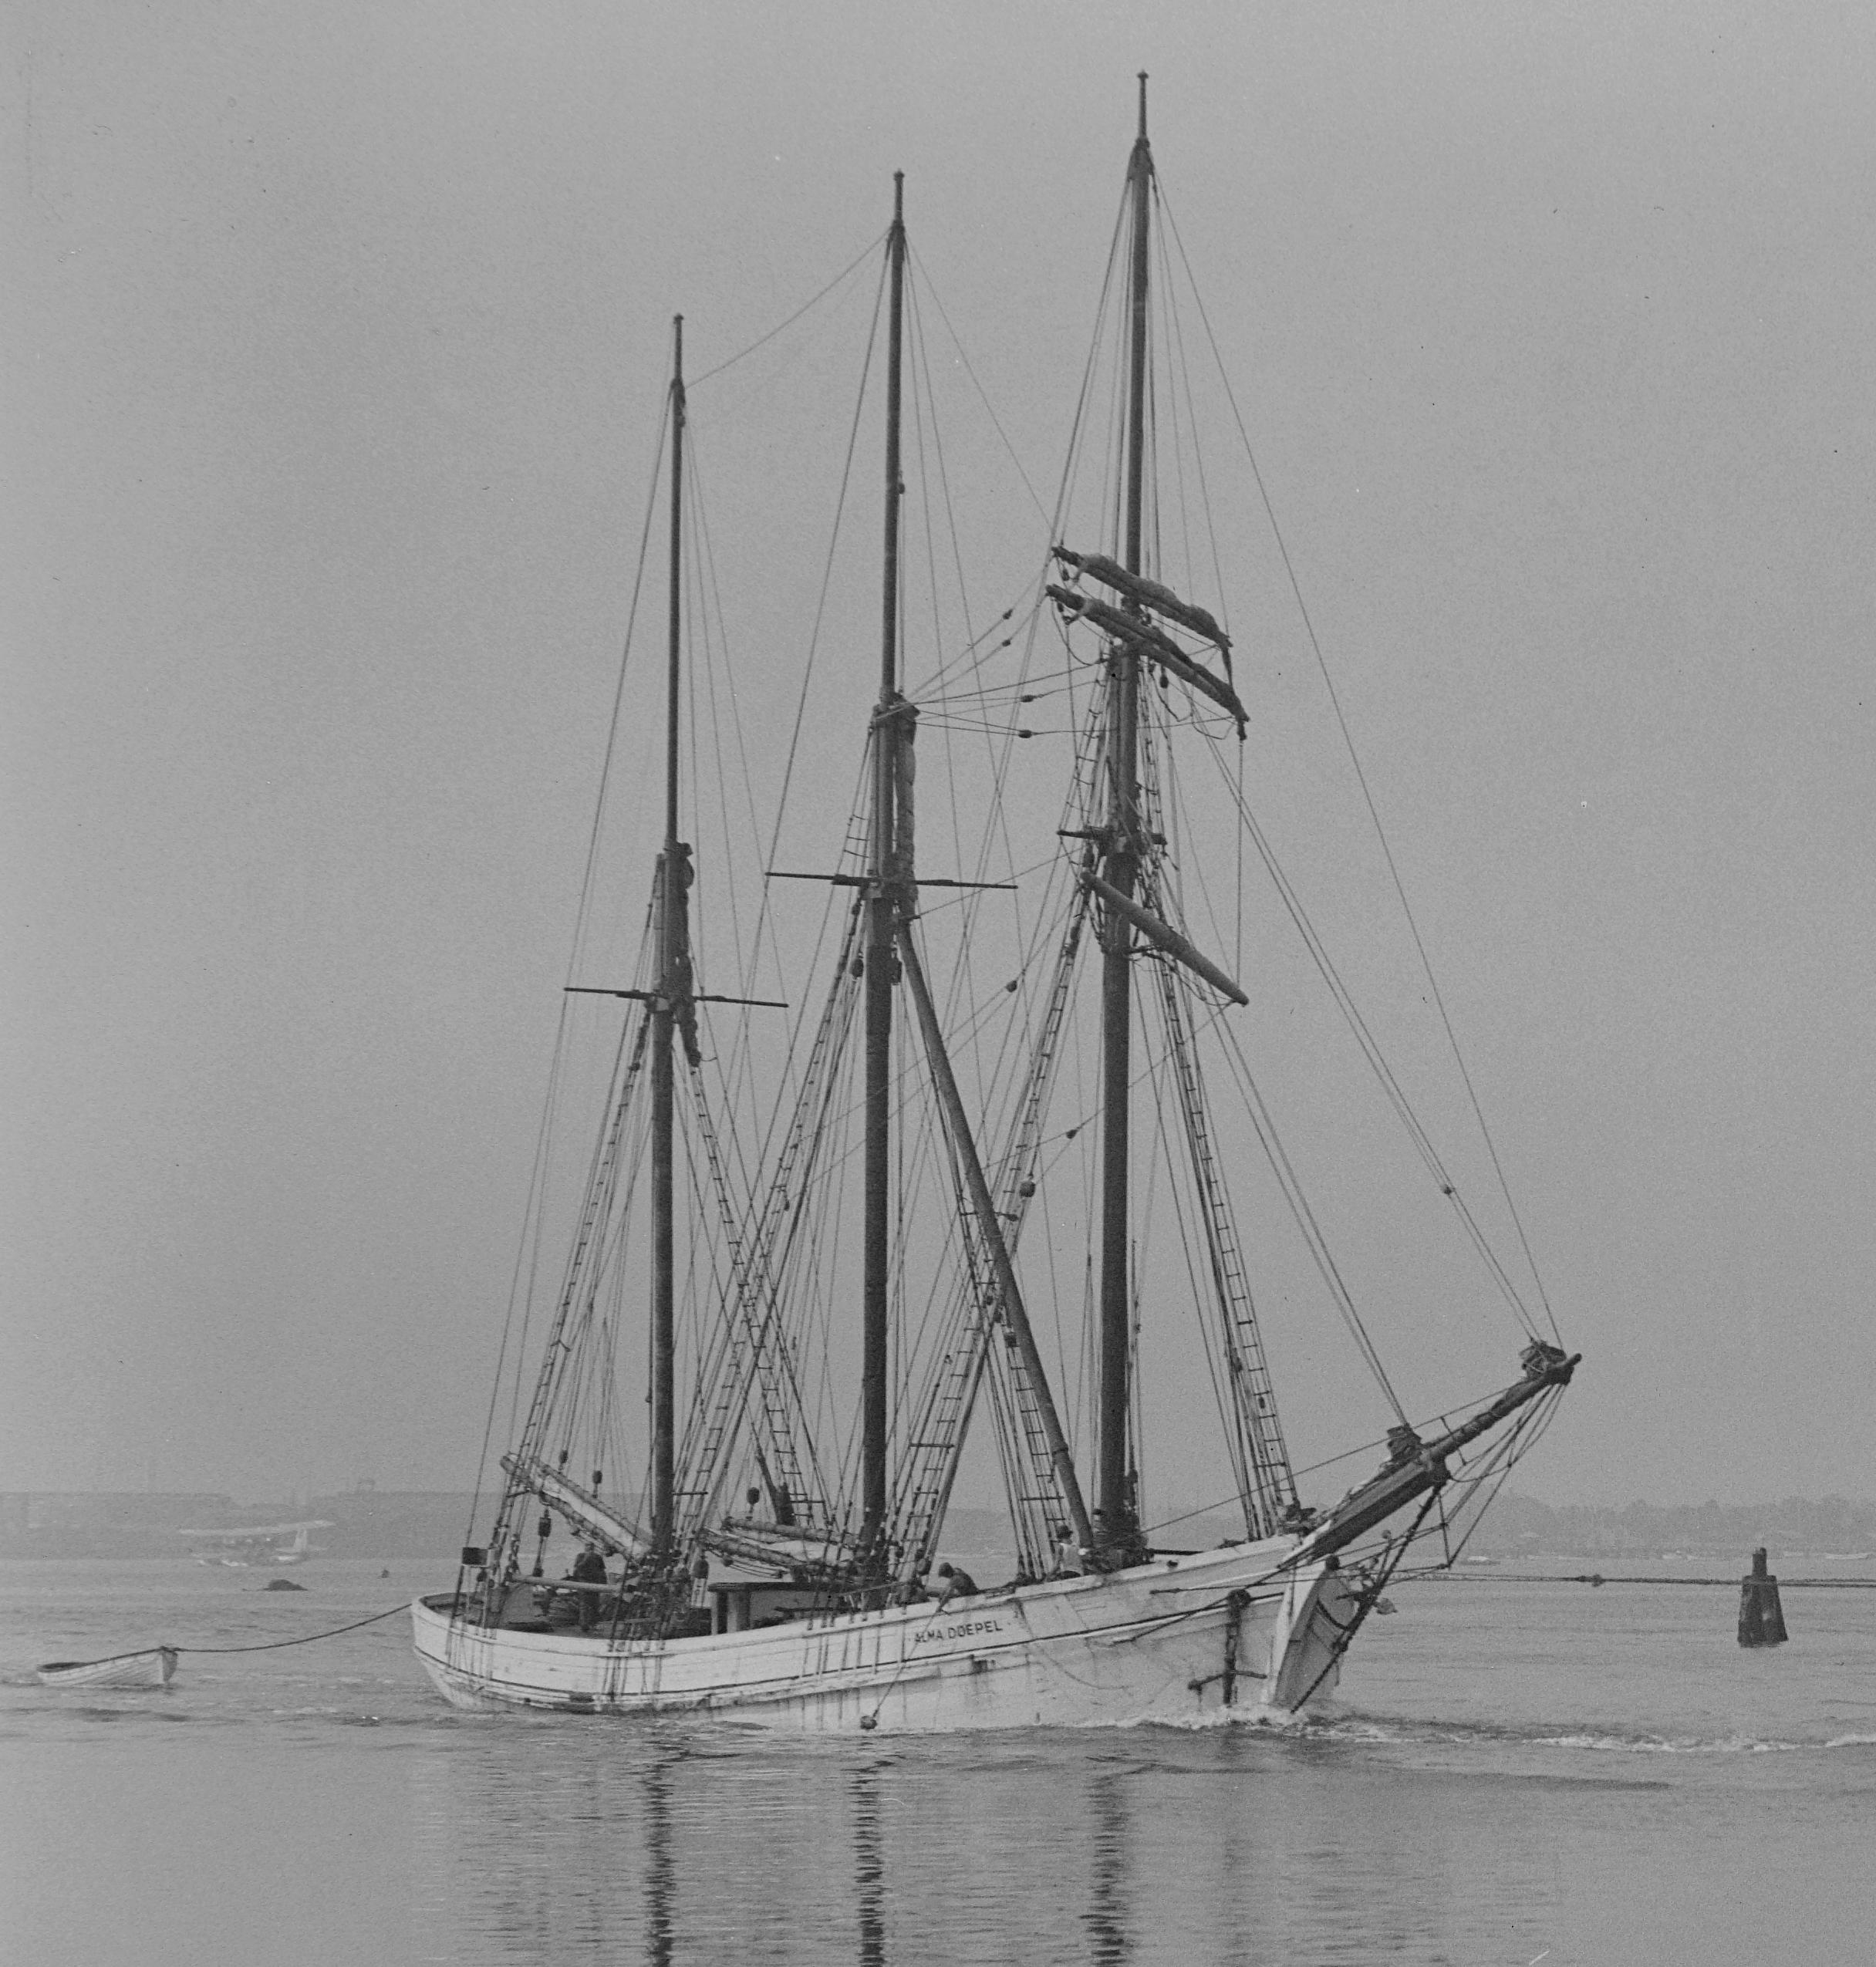 Alma_Doepel_(ship,_1903)_%26_Sprightly_(tug)_-_SLV_H91.108-3125_b.jpg